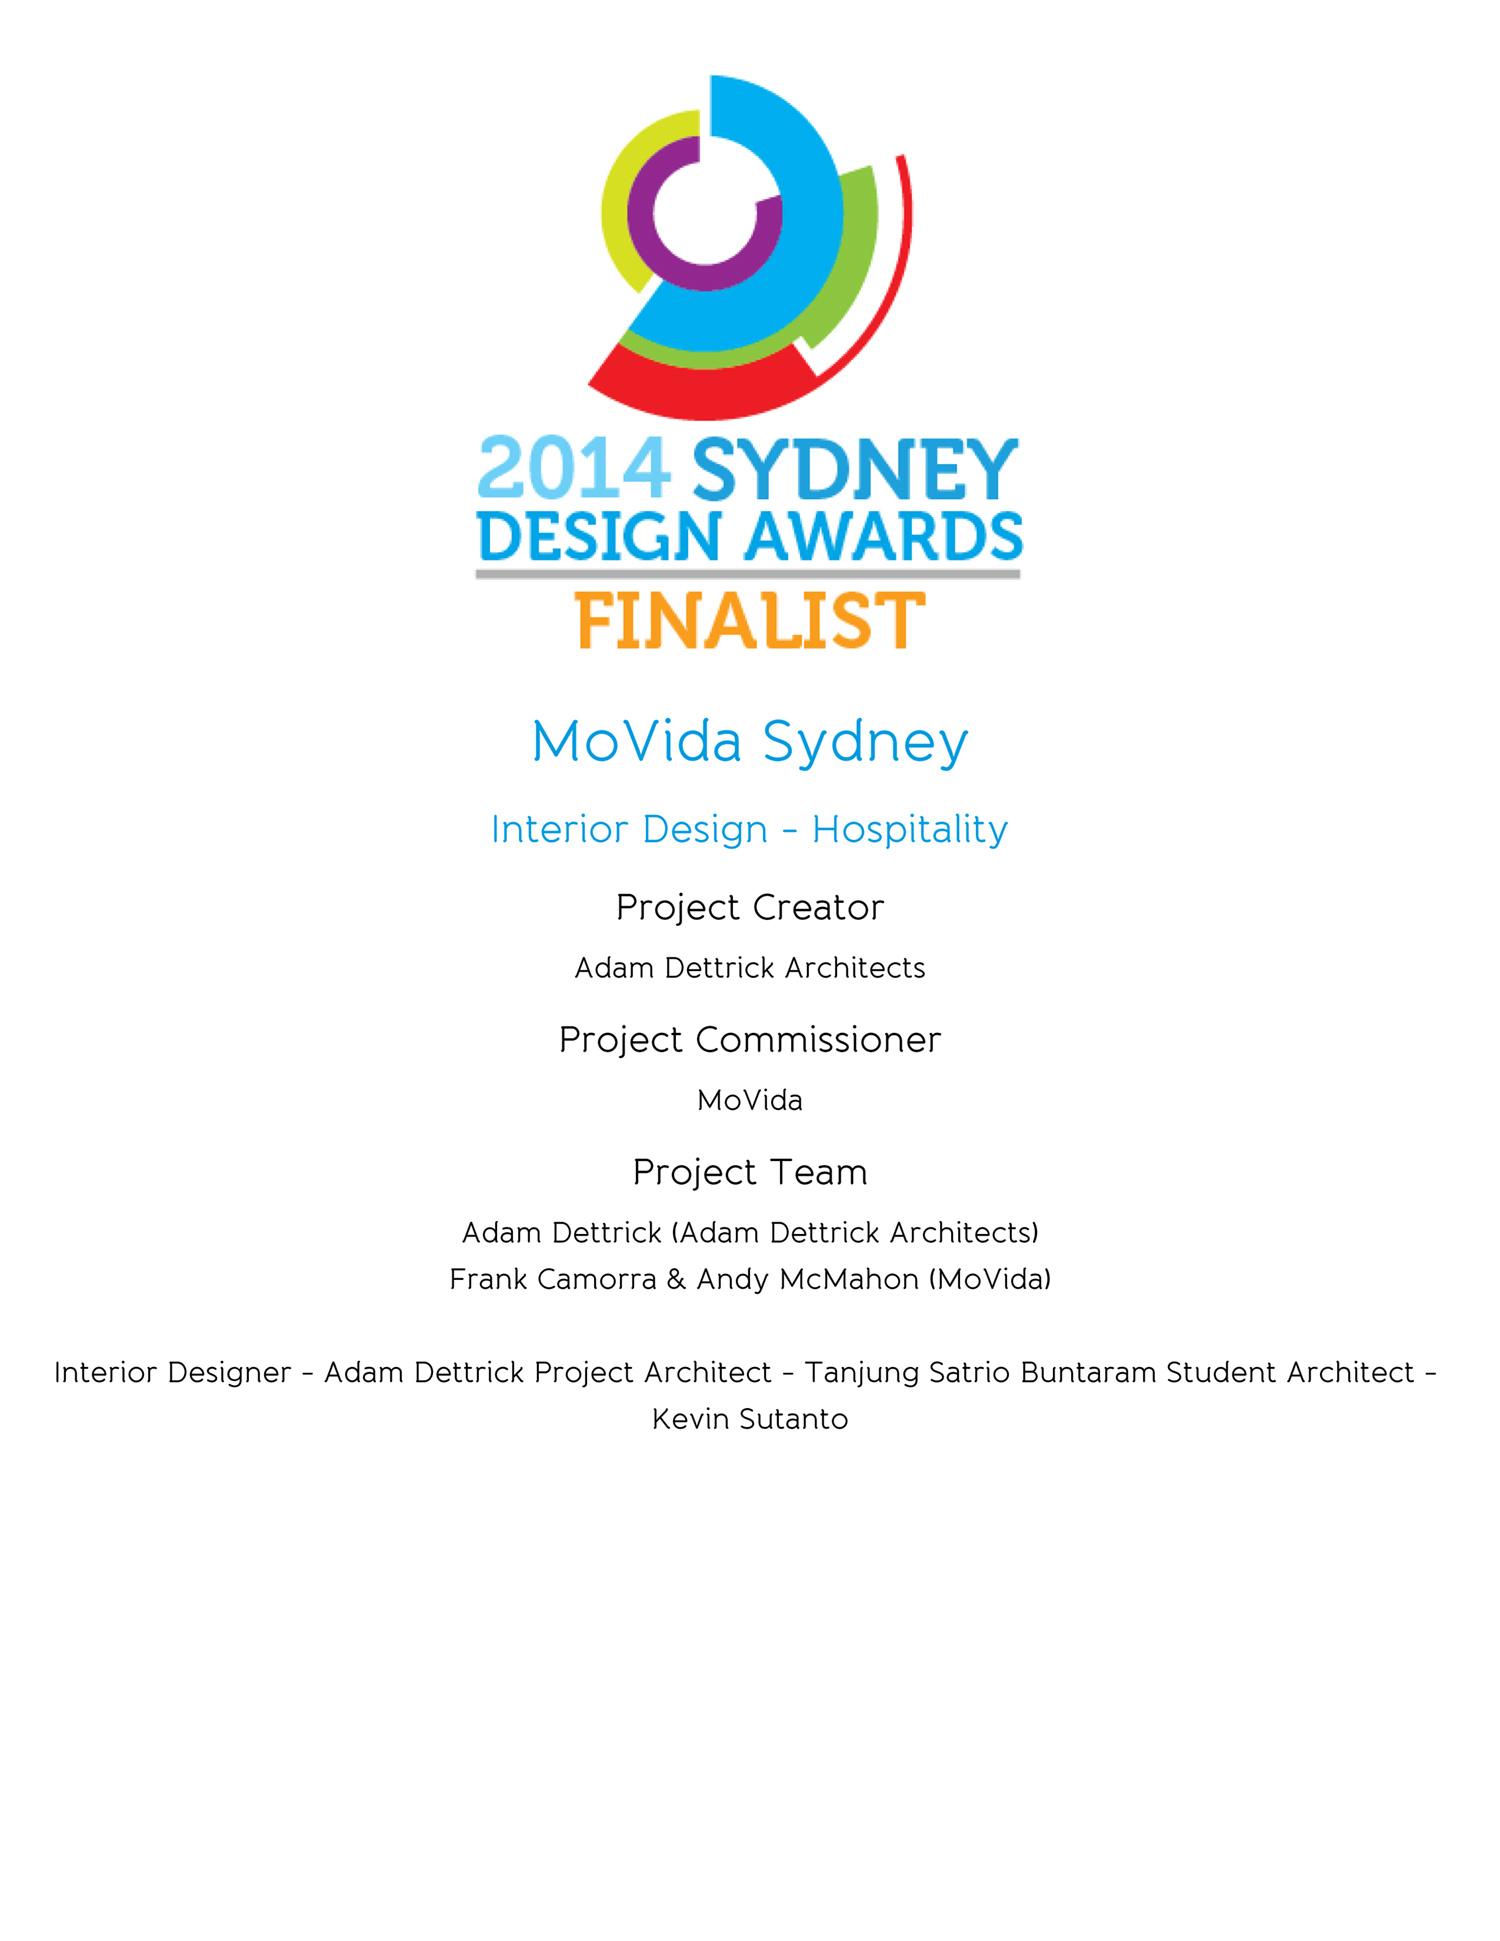 Movida Sydney is a finalist in the 2014 Sydney Design Awards.